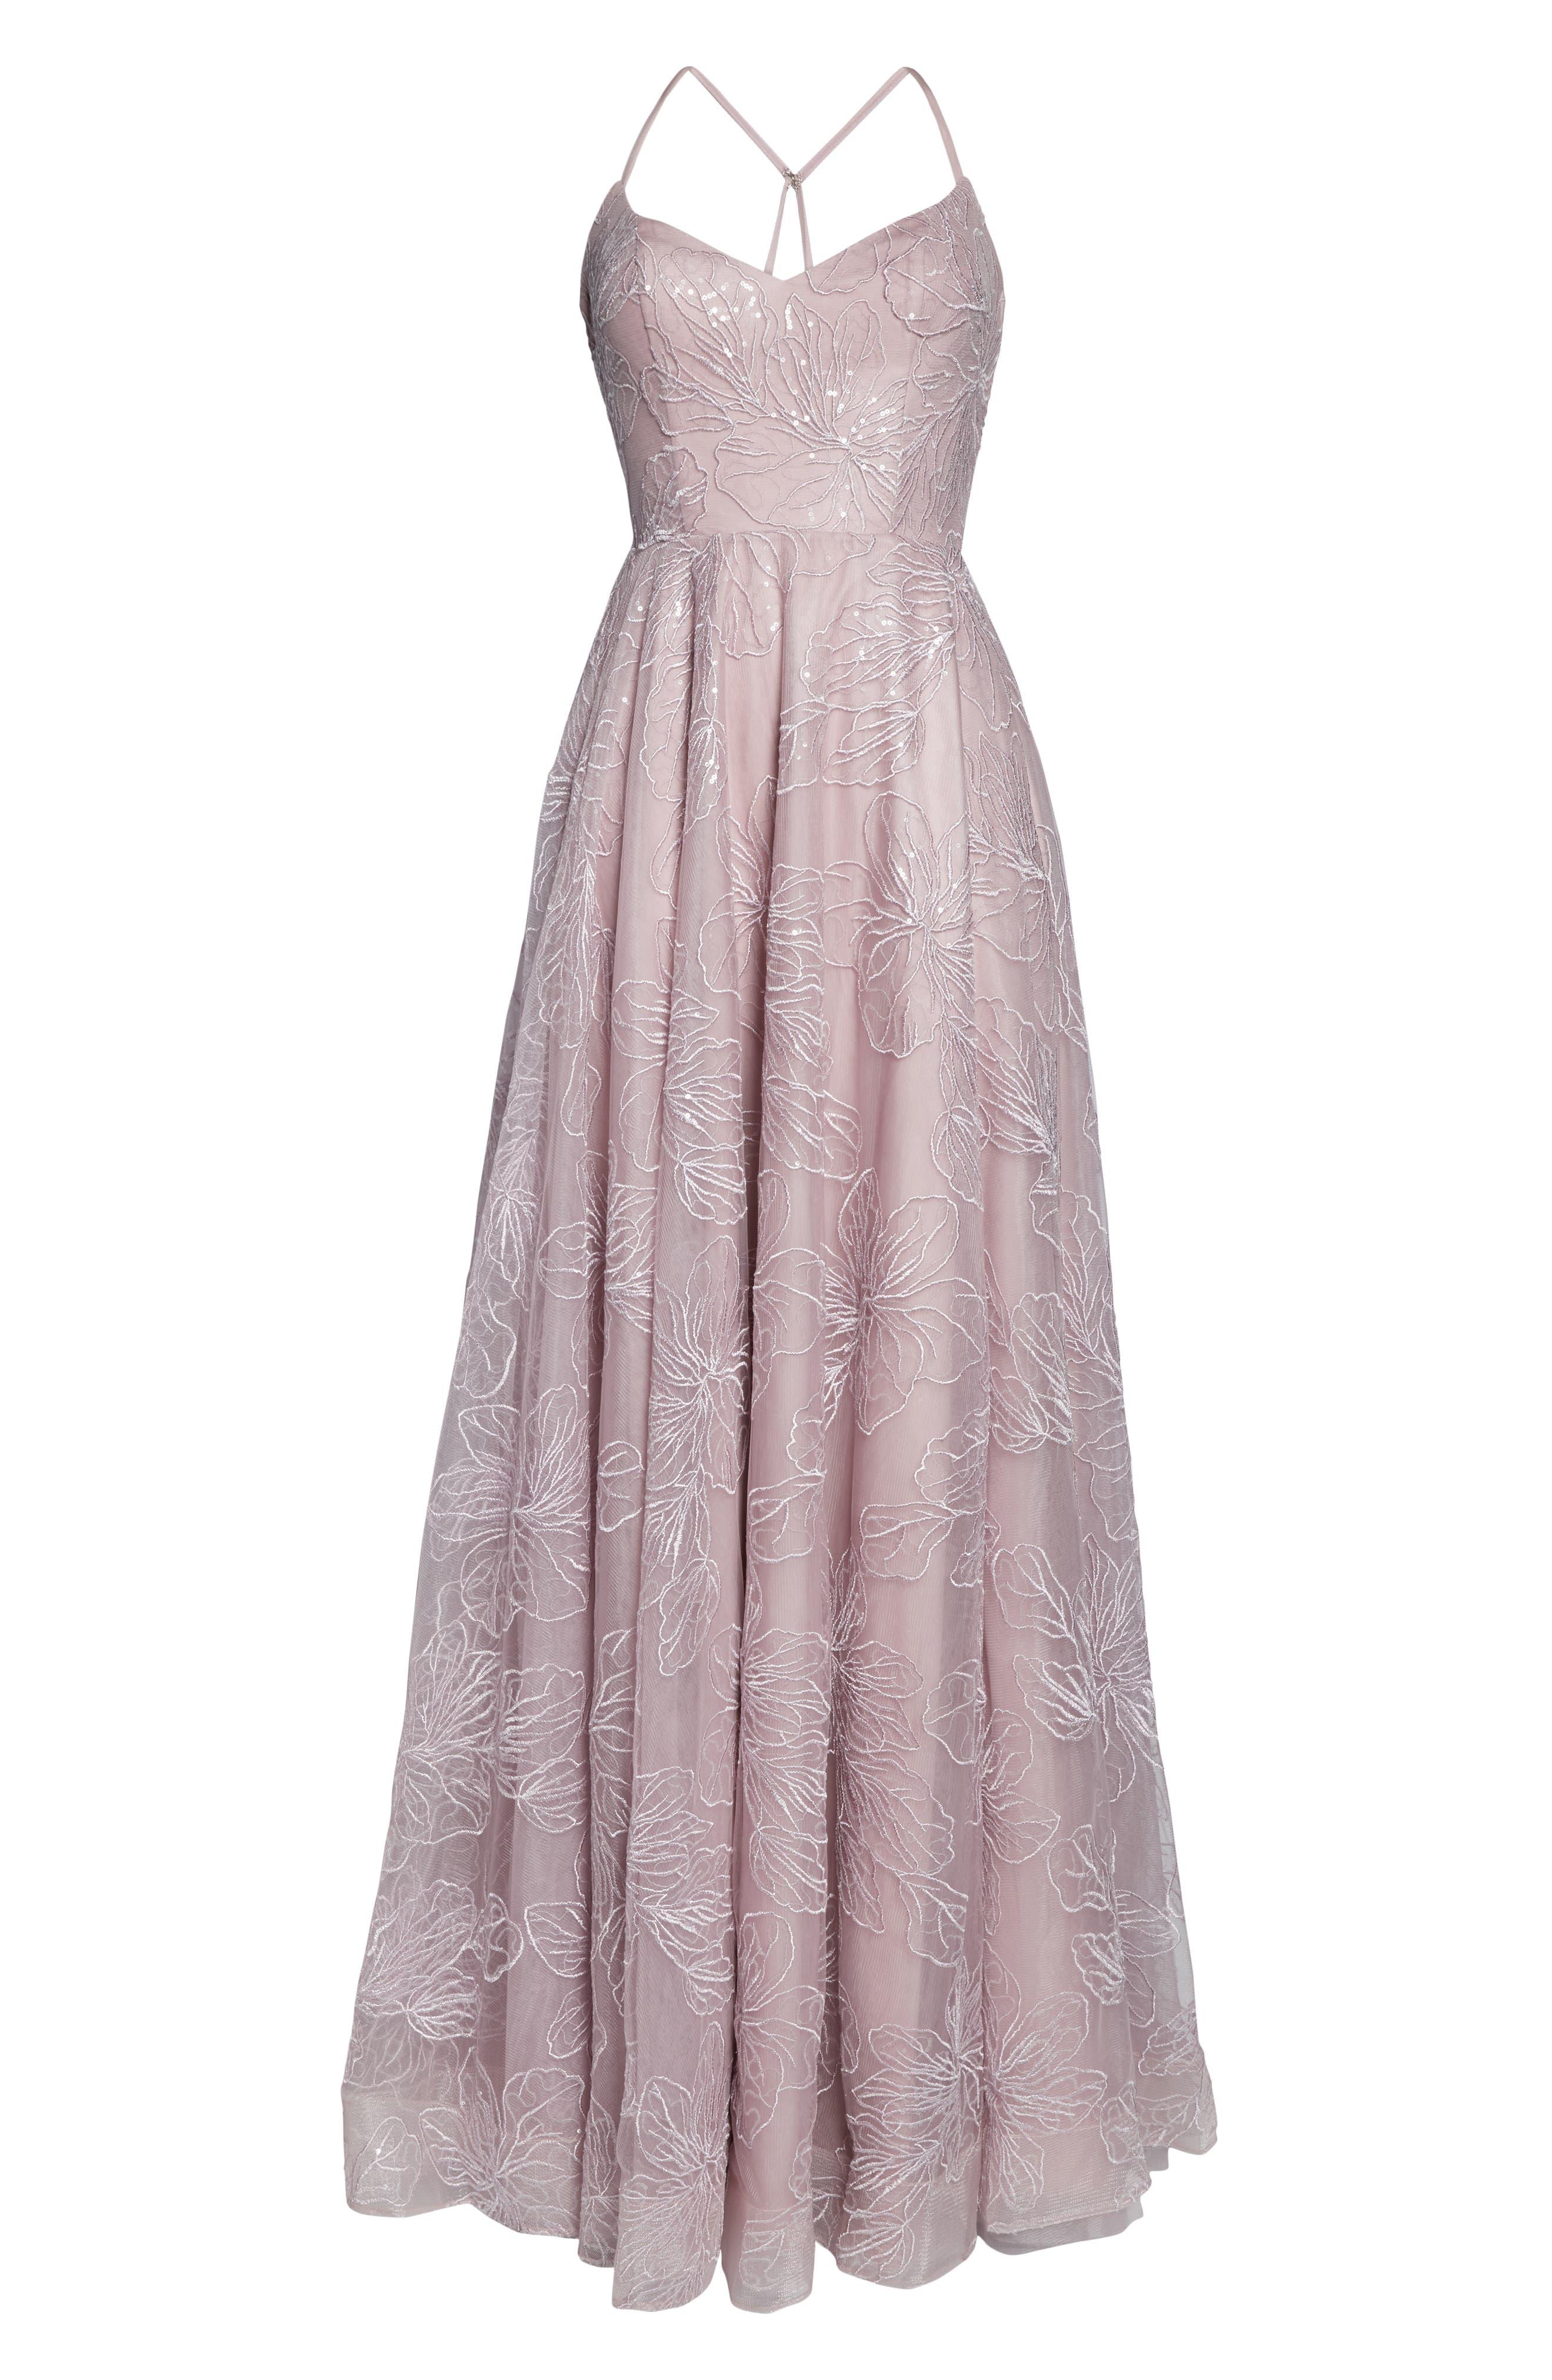 LA FEMME, Metallic Floral Embellished Evening Dress, Alternate thumbnail 8, color, MAUVE